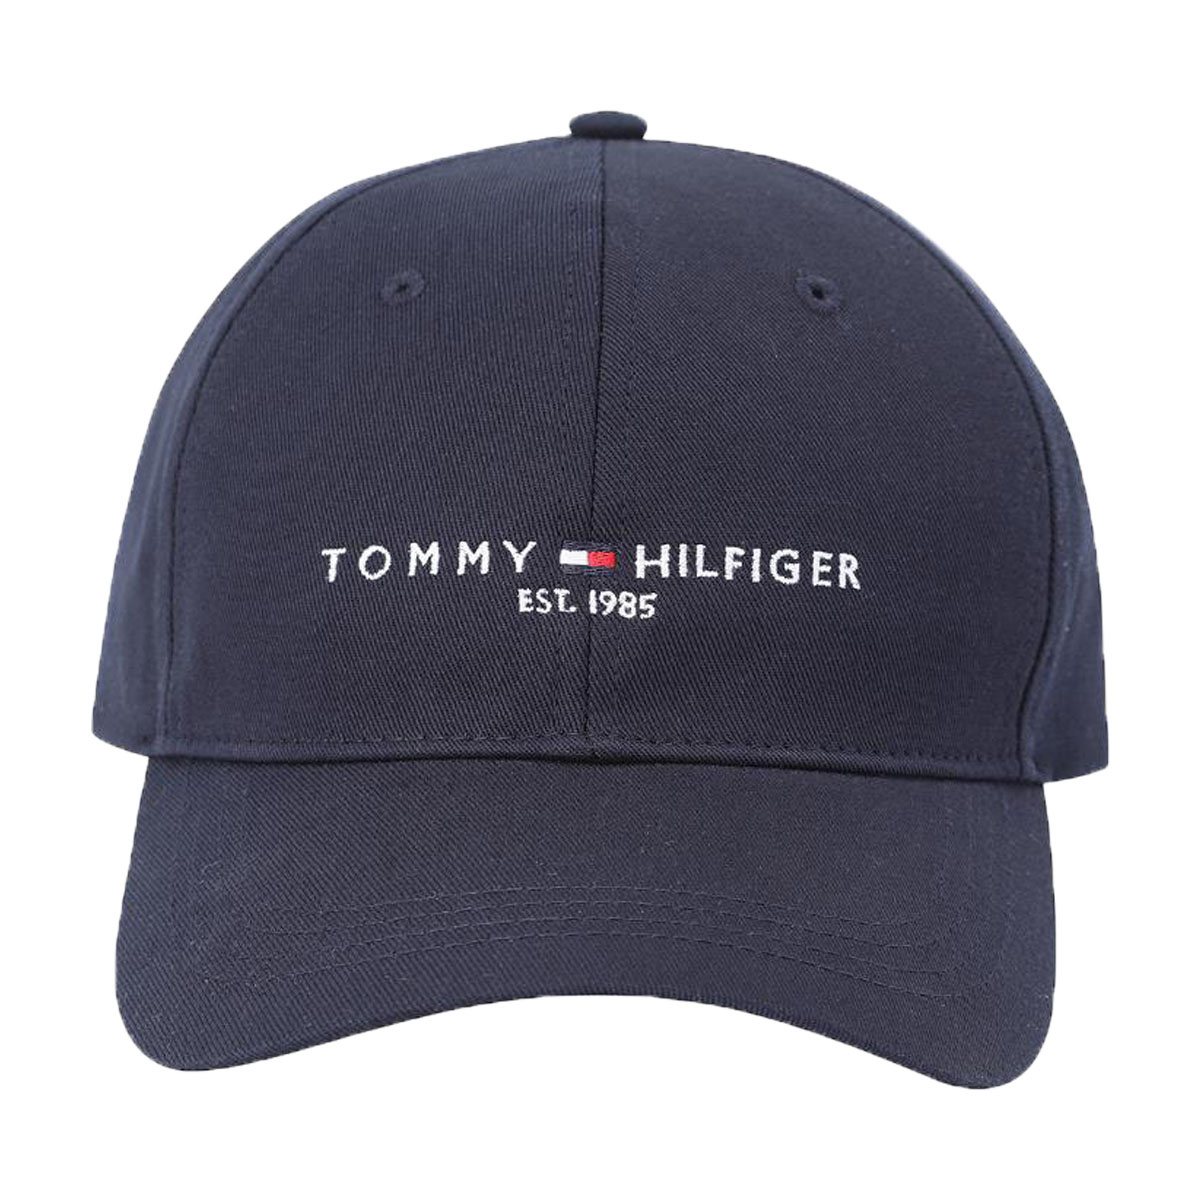 Boné Tommy Hilfiger Established Cap Azul Marinho